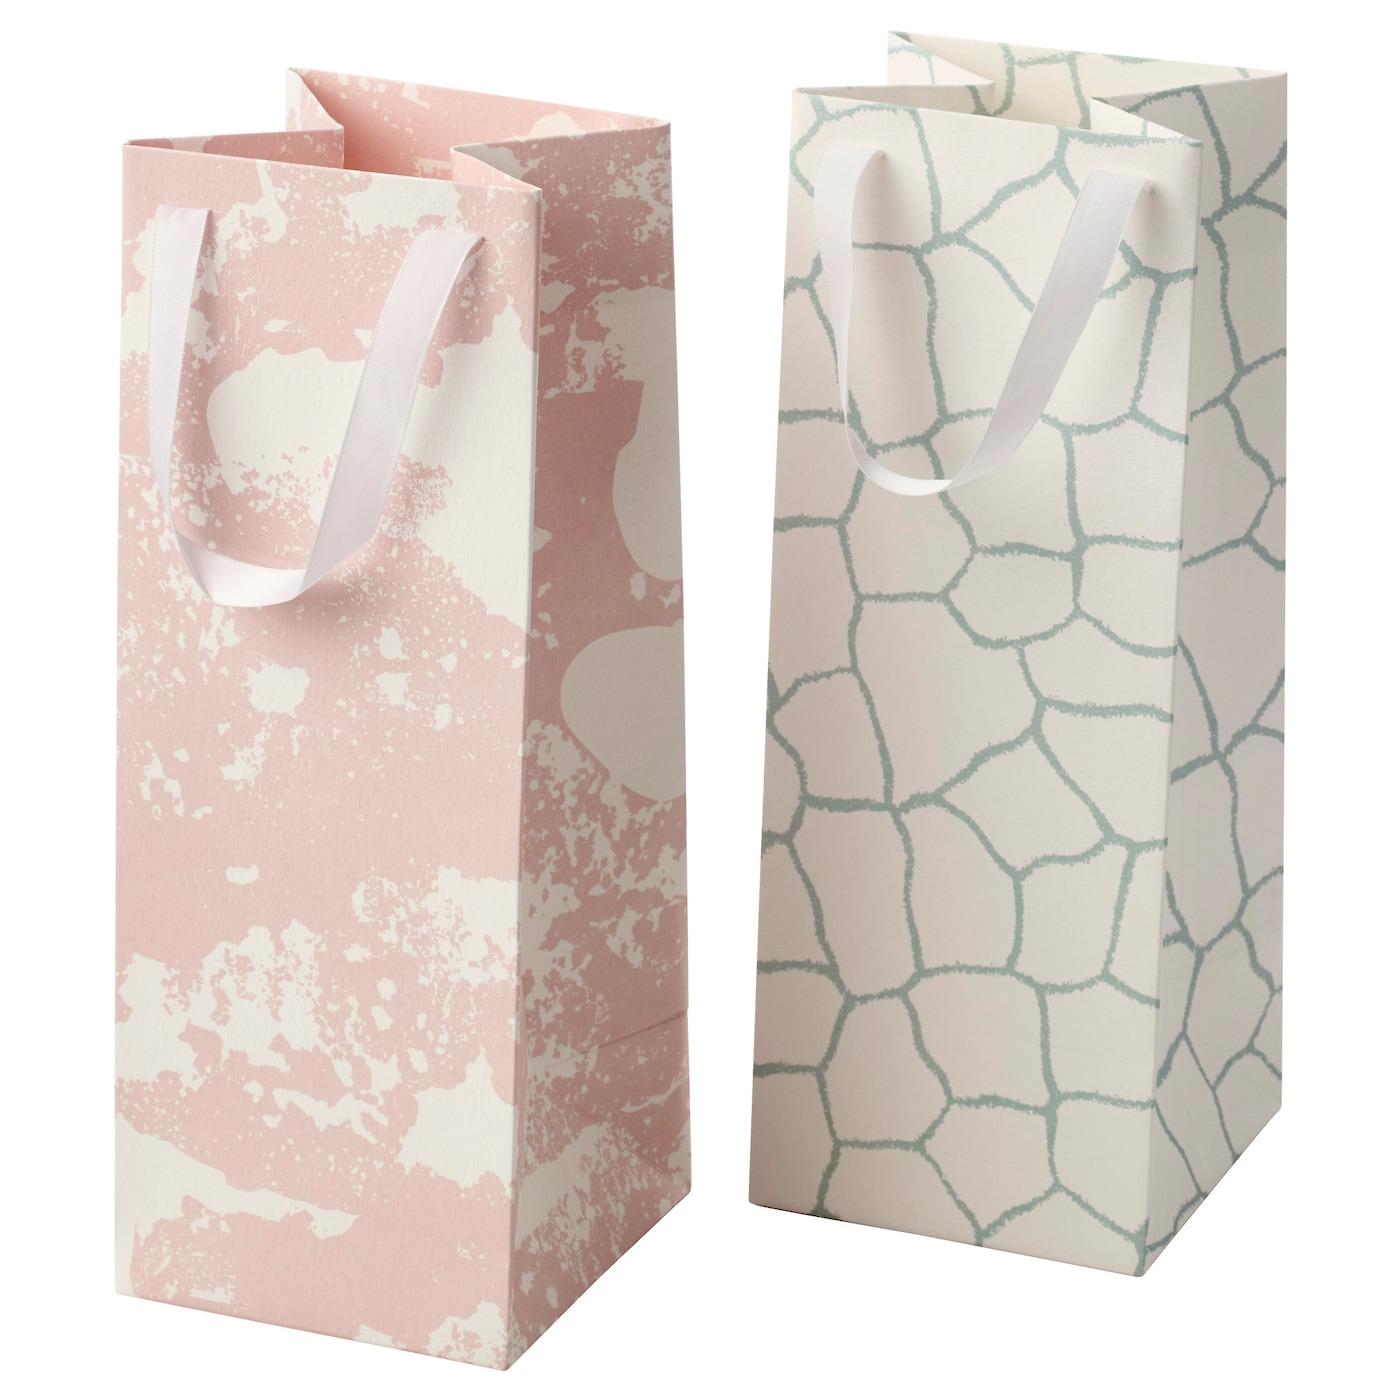 m ngfald sac cadeau motifs divers 12x32 cm ikea. Black Bedroom Furniture Sets. Home Design Ideas